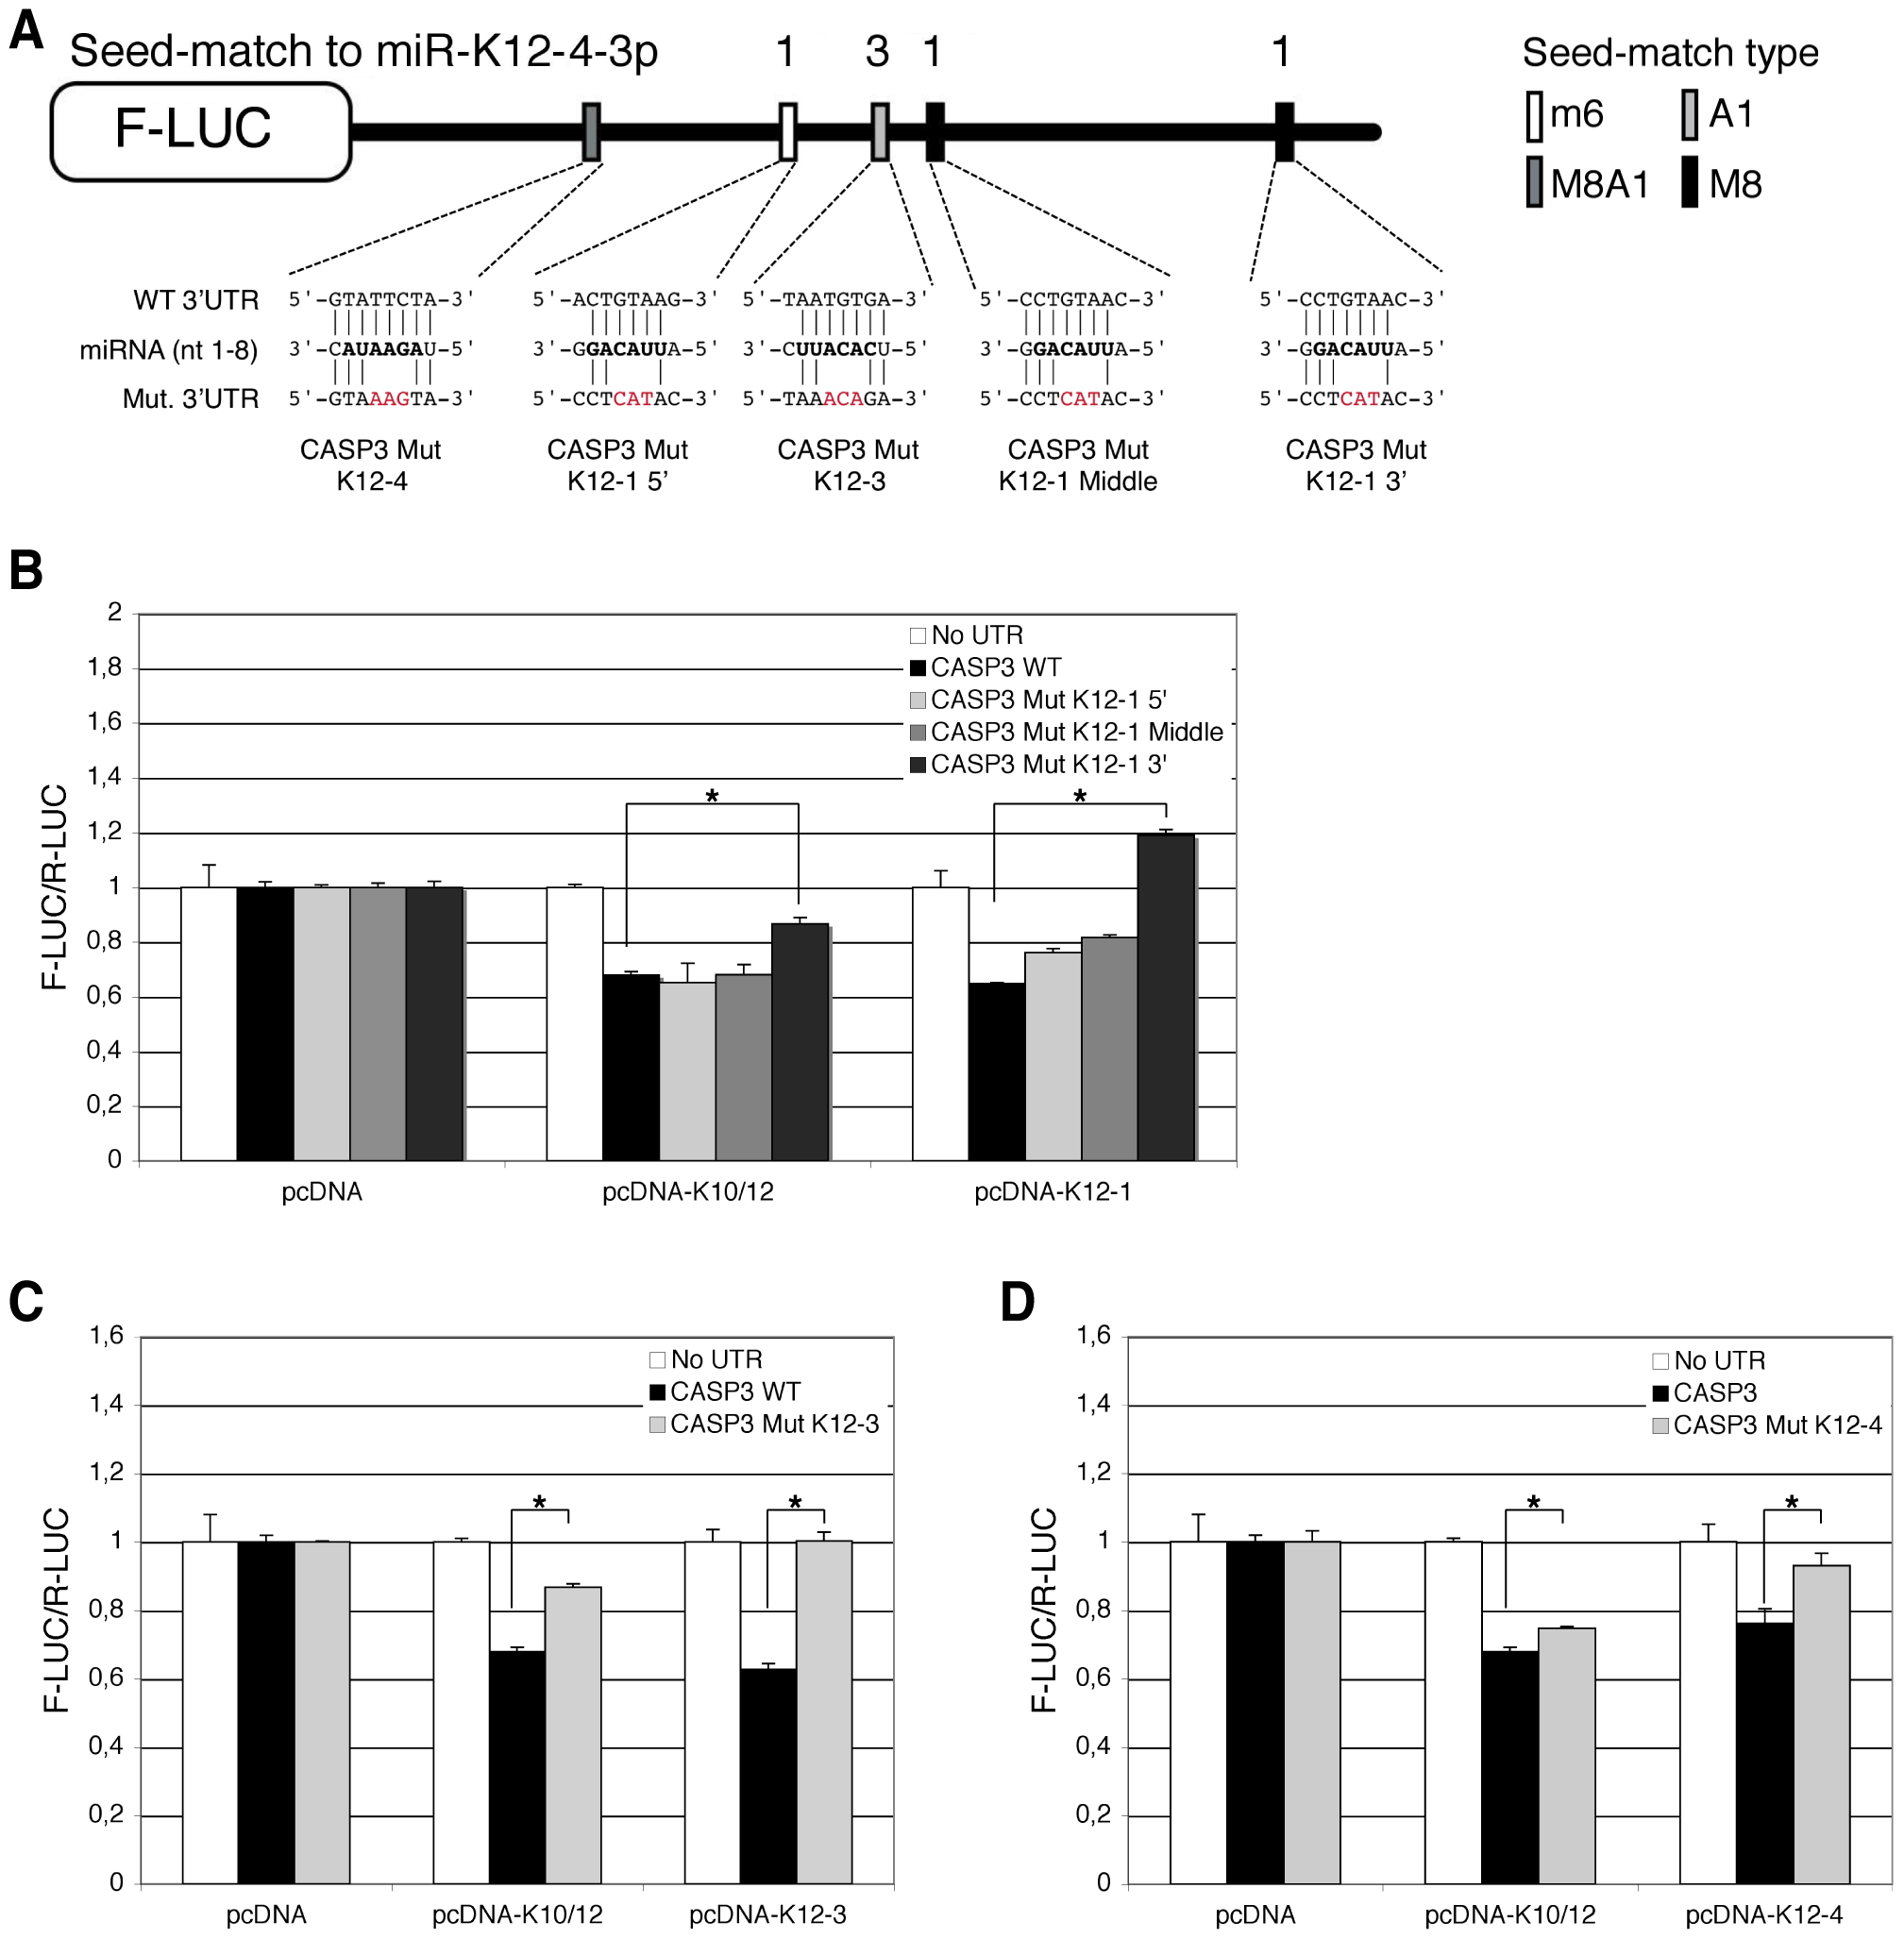 Identification of KSHV miRNAs binding sites in the 3′ UTR of Casp3 transcript by mutational analysis.